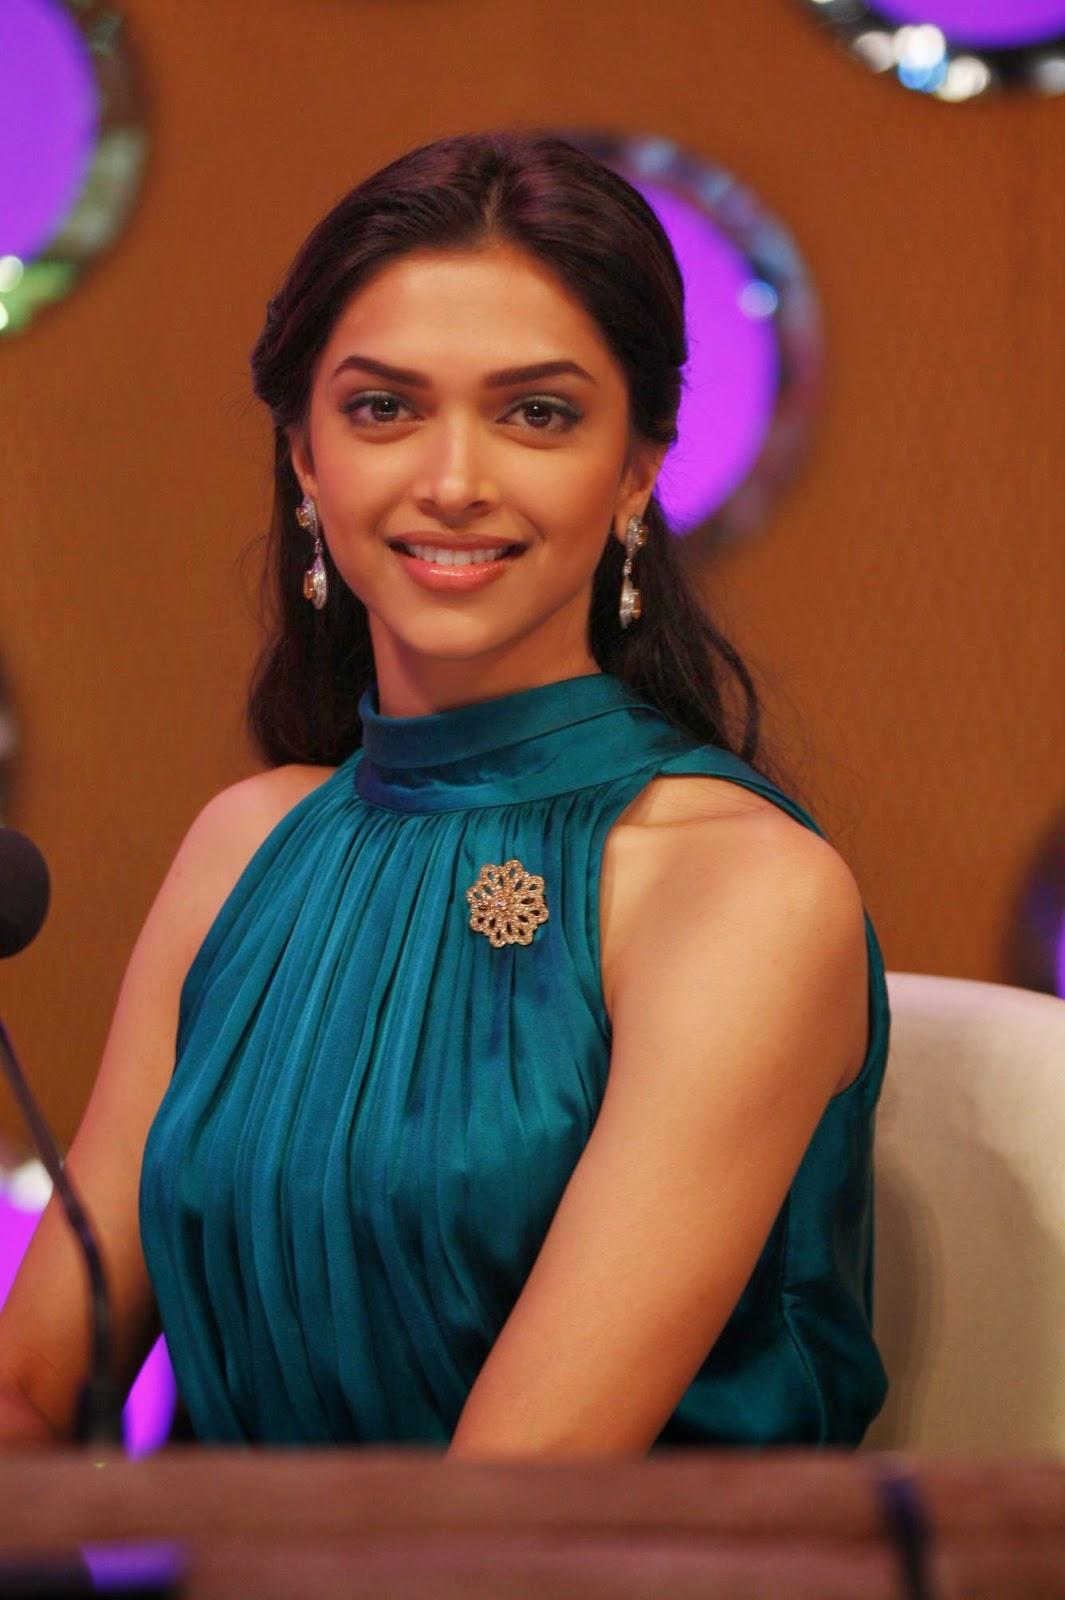 Deepika Padukone boobs closeup captured pics